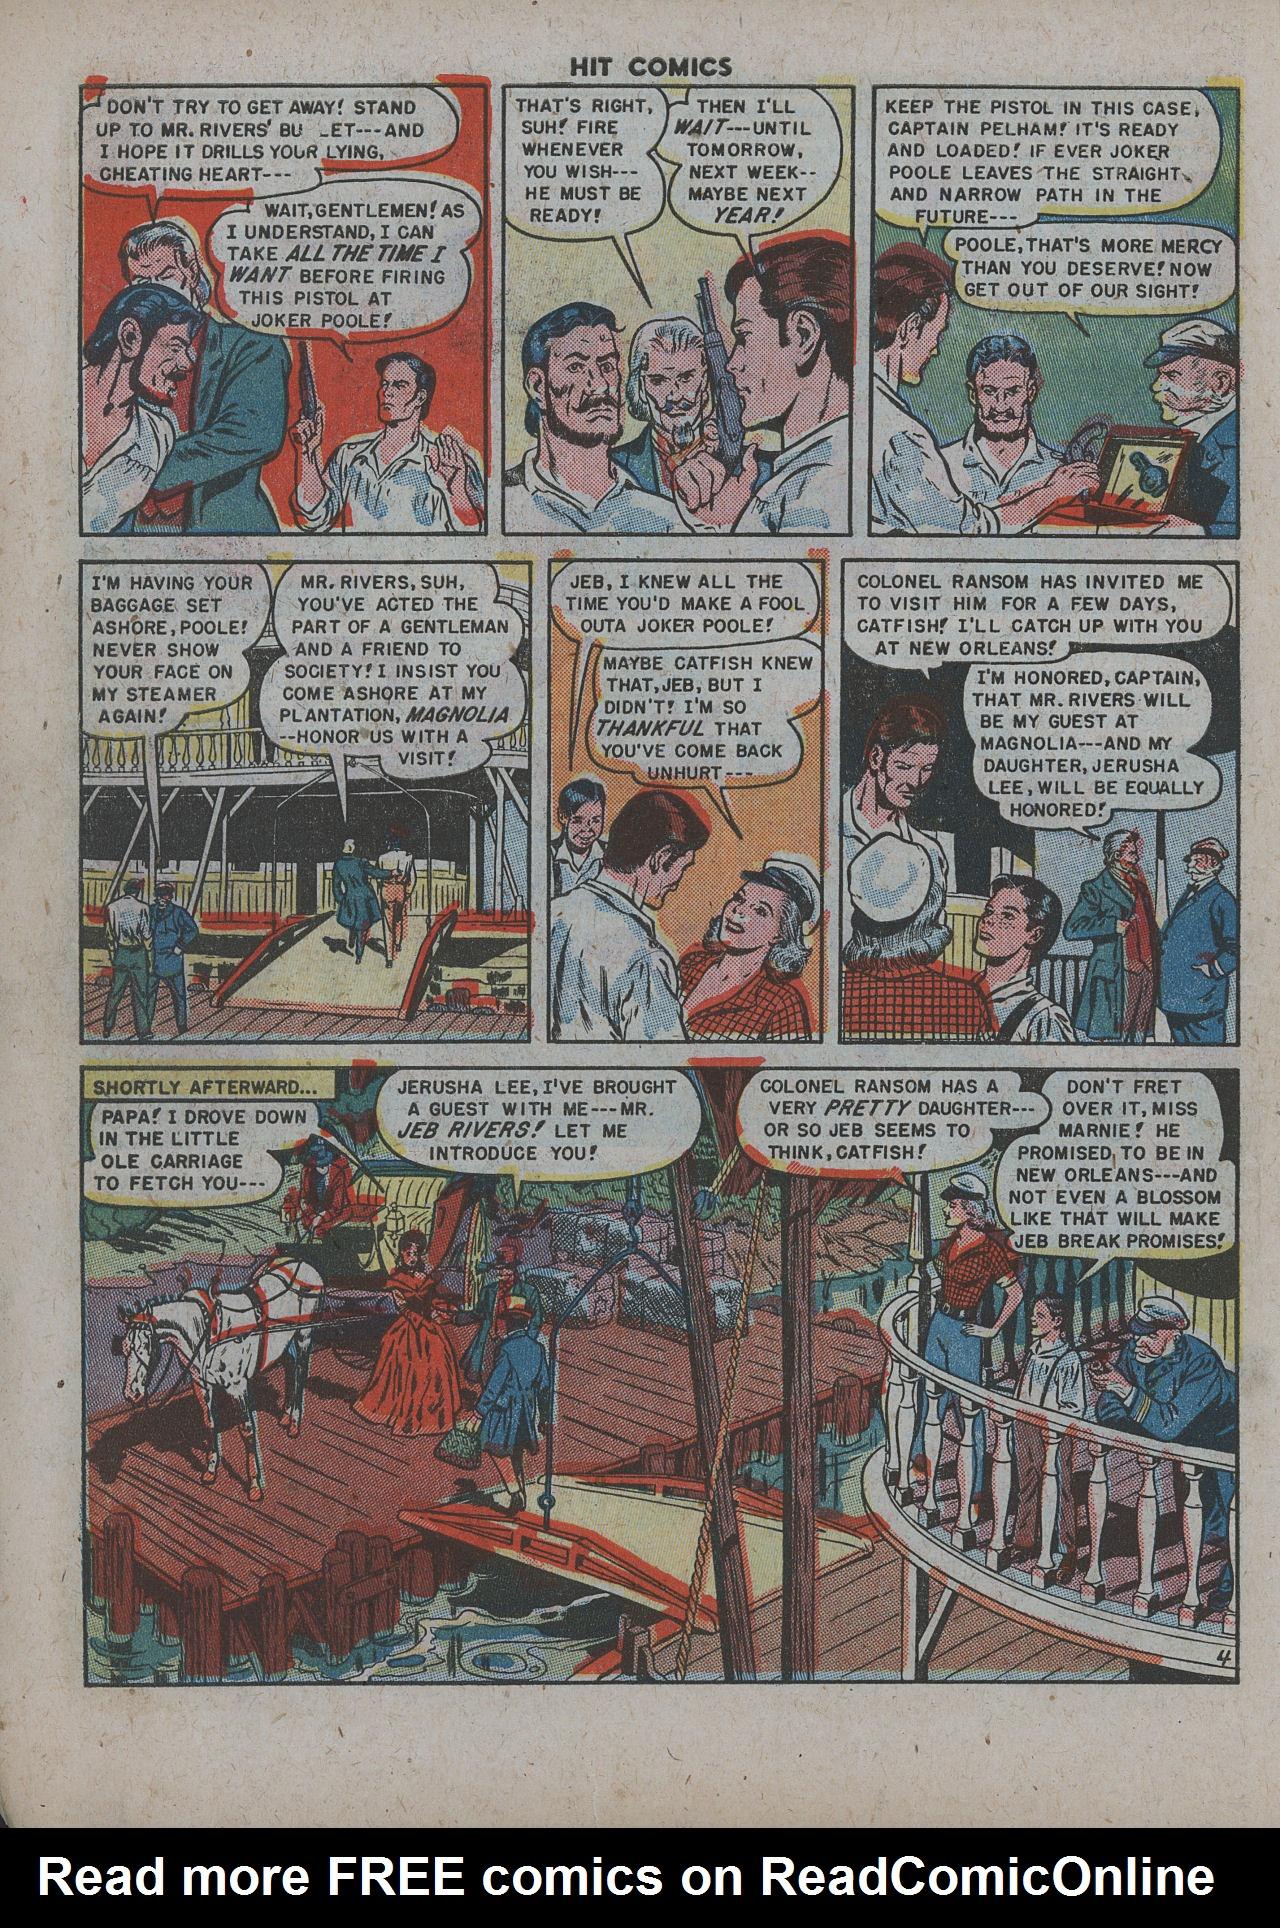 Read online Hit Comics comic -  Issue #63 - 6